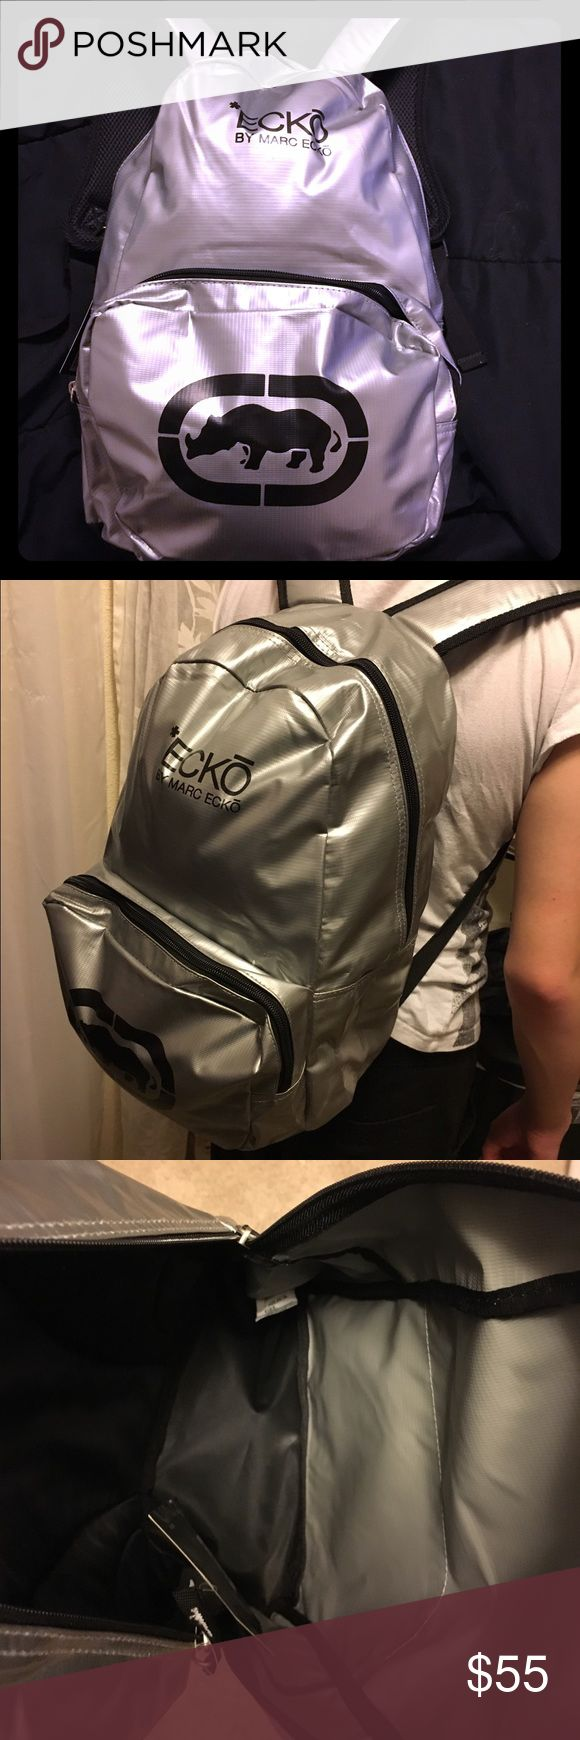 Google themes ecko - Silver Ecko Backpack Marc Ecko Back Pack Bag In Silver In Black Never Used Ecko